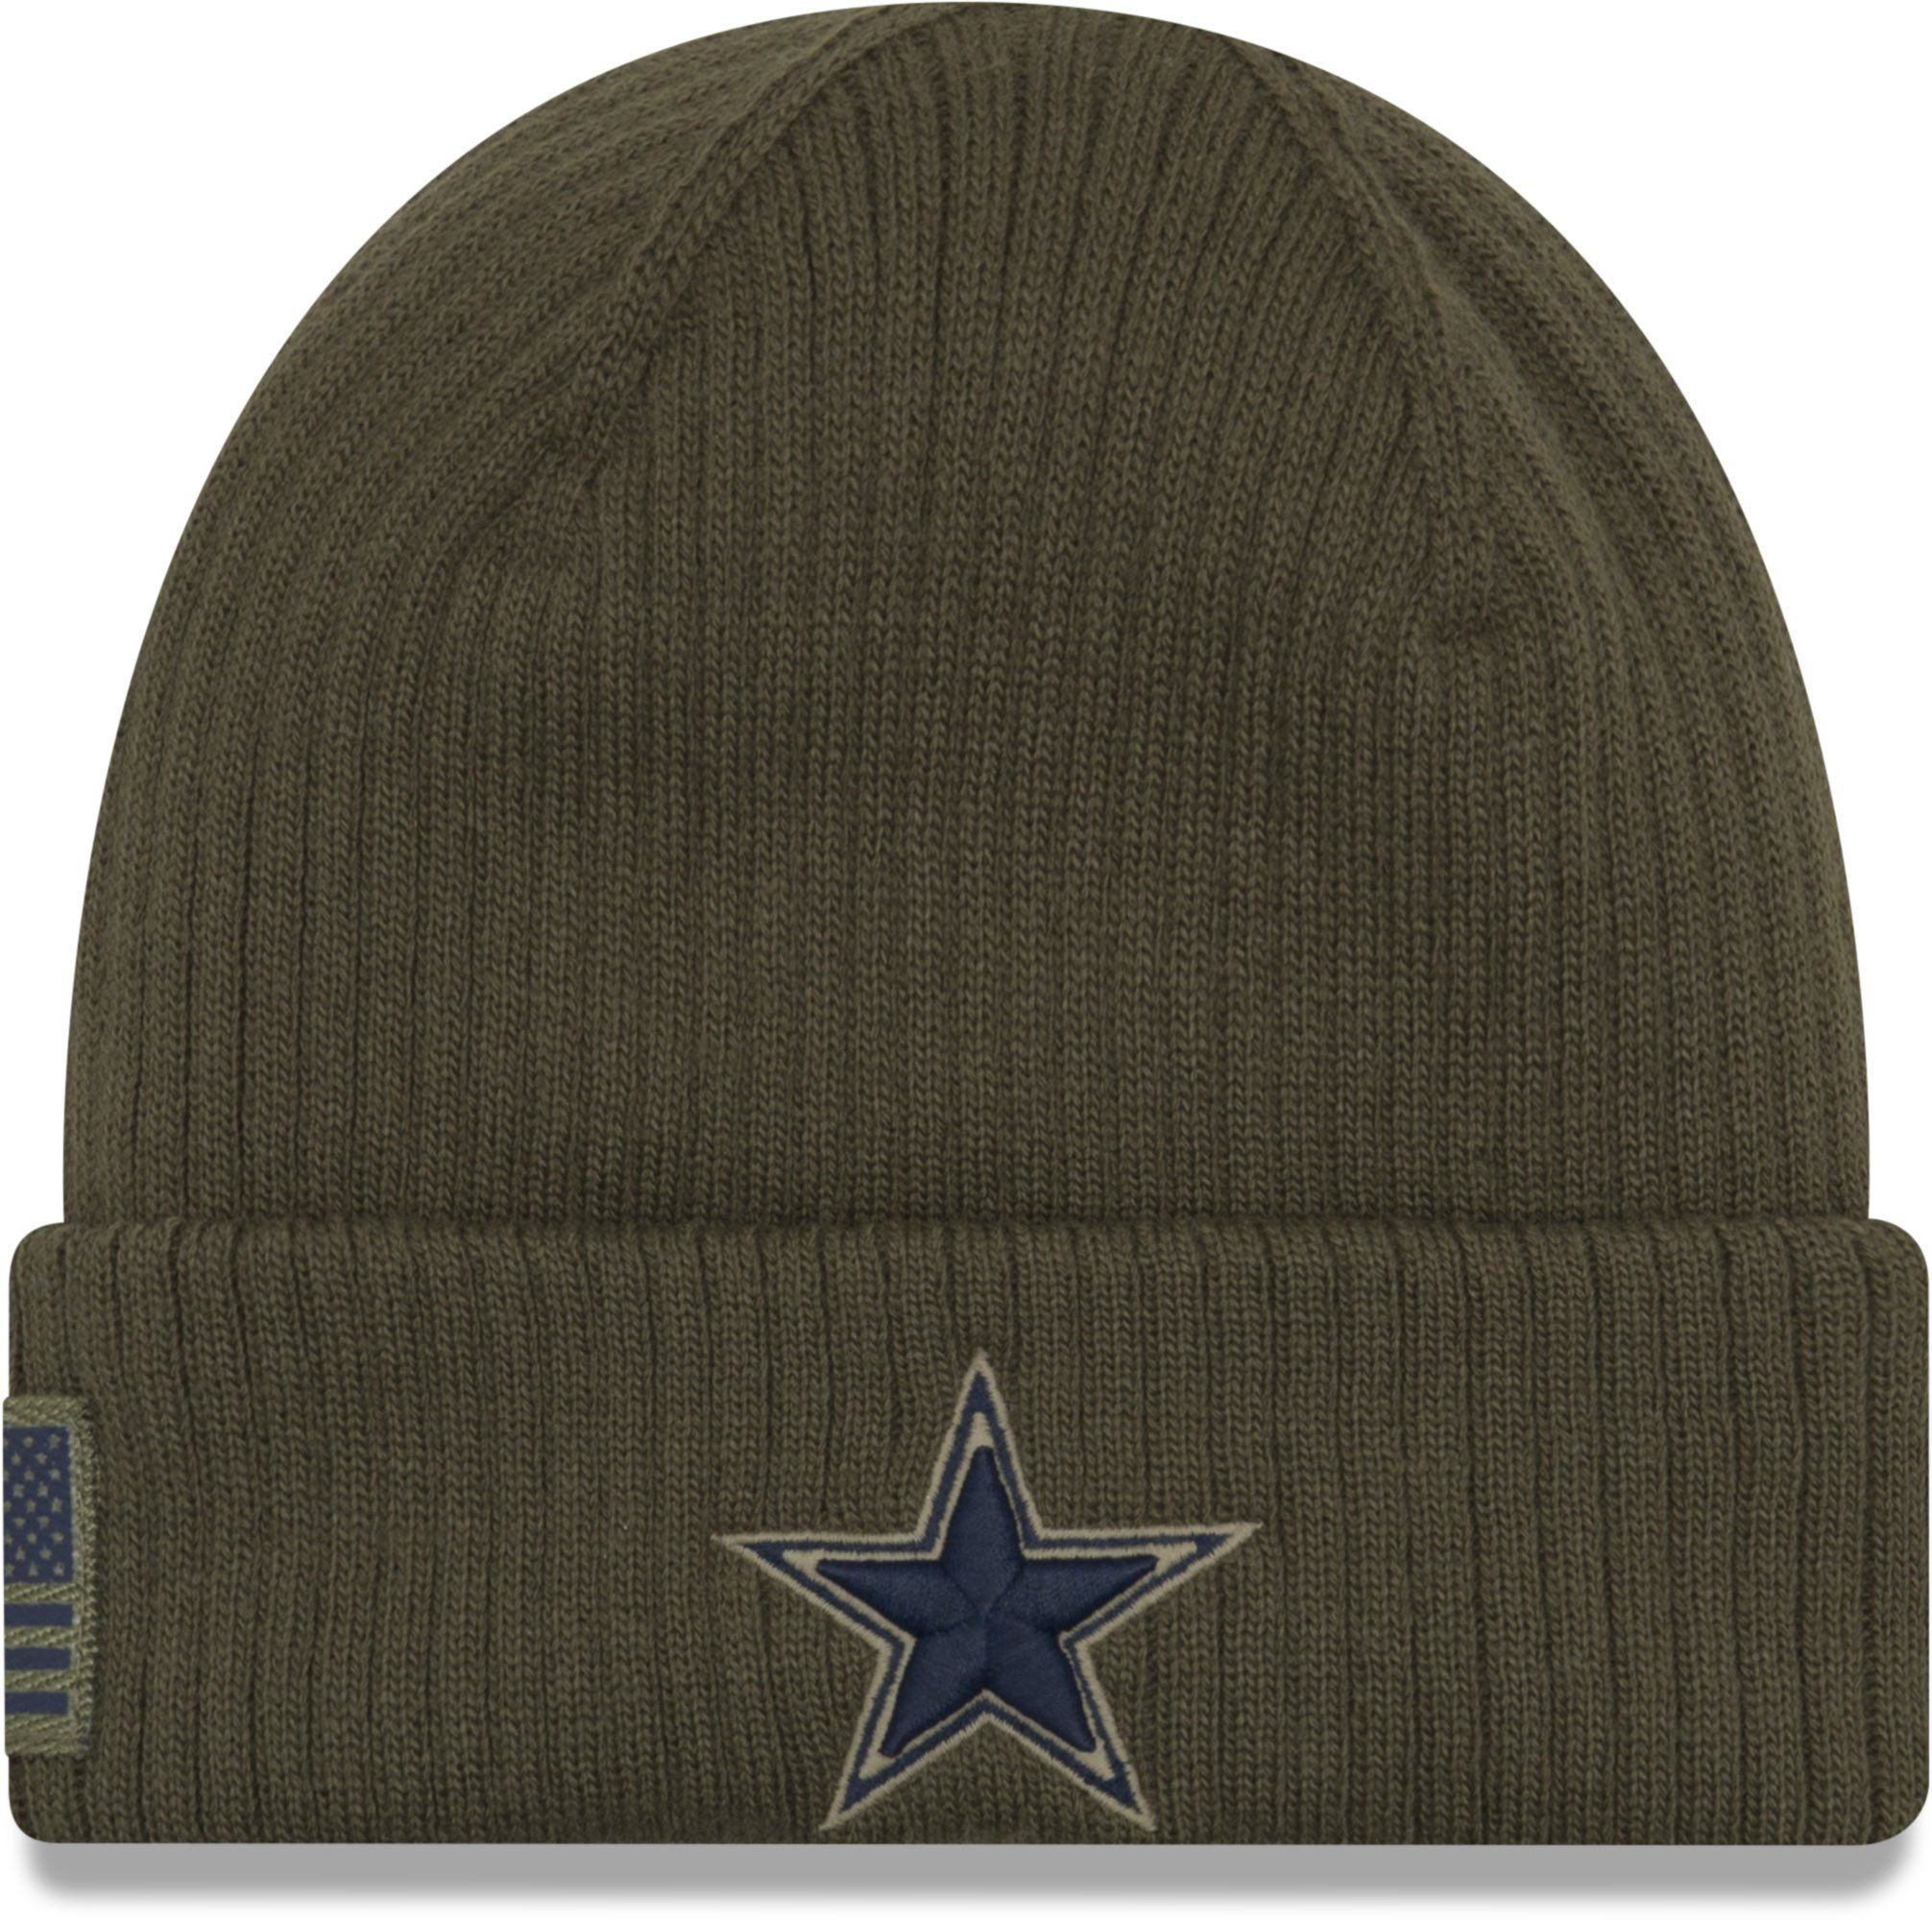 5e2ea281 Dallas Cowboys New Era Knit On Field 2018 STS Beanie – lovemycap ...